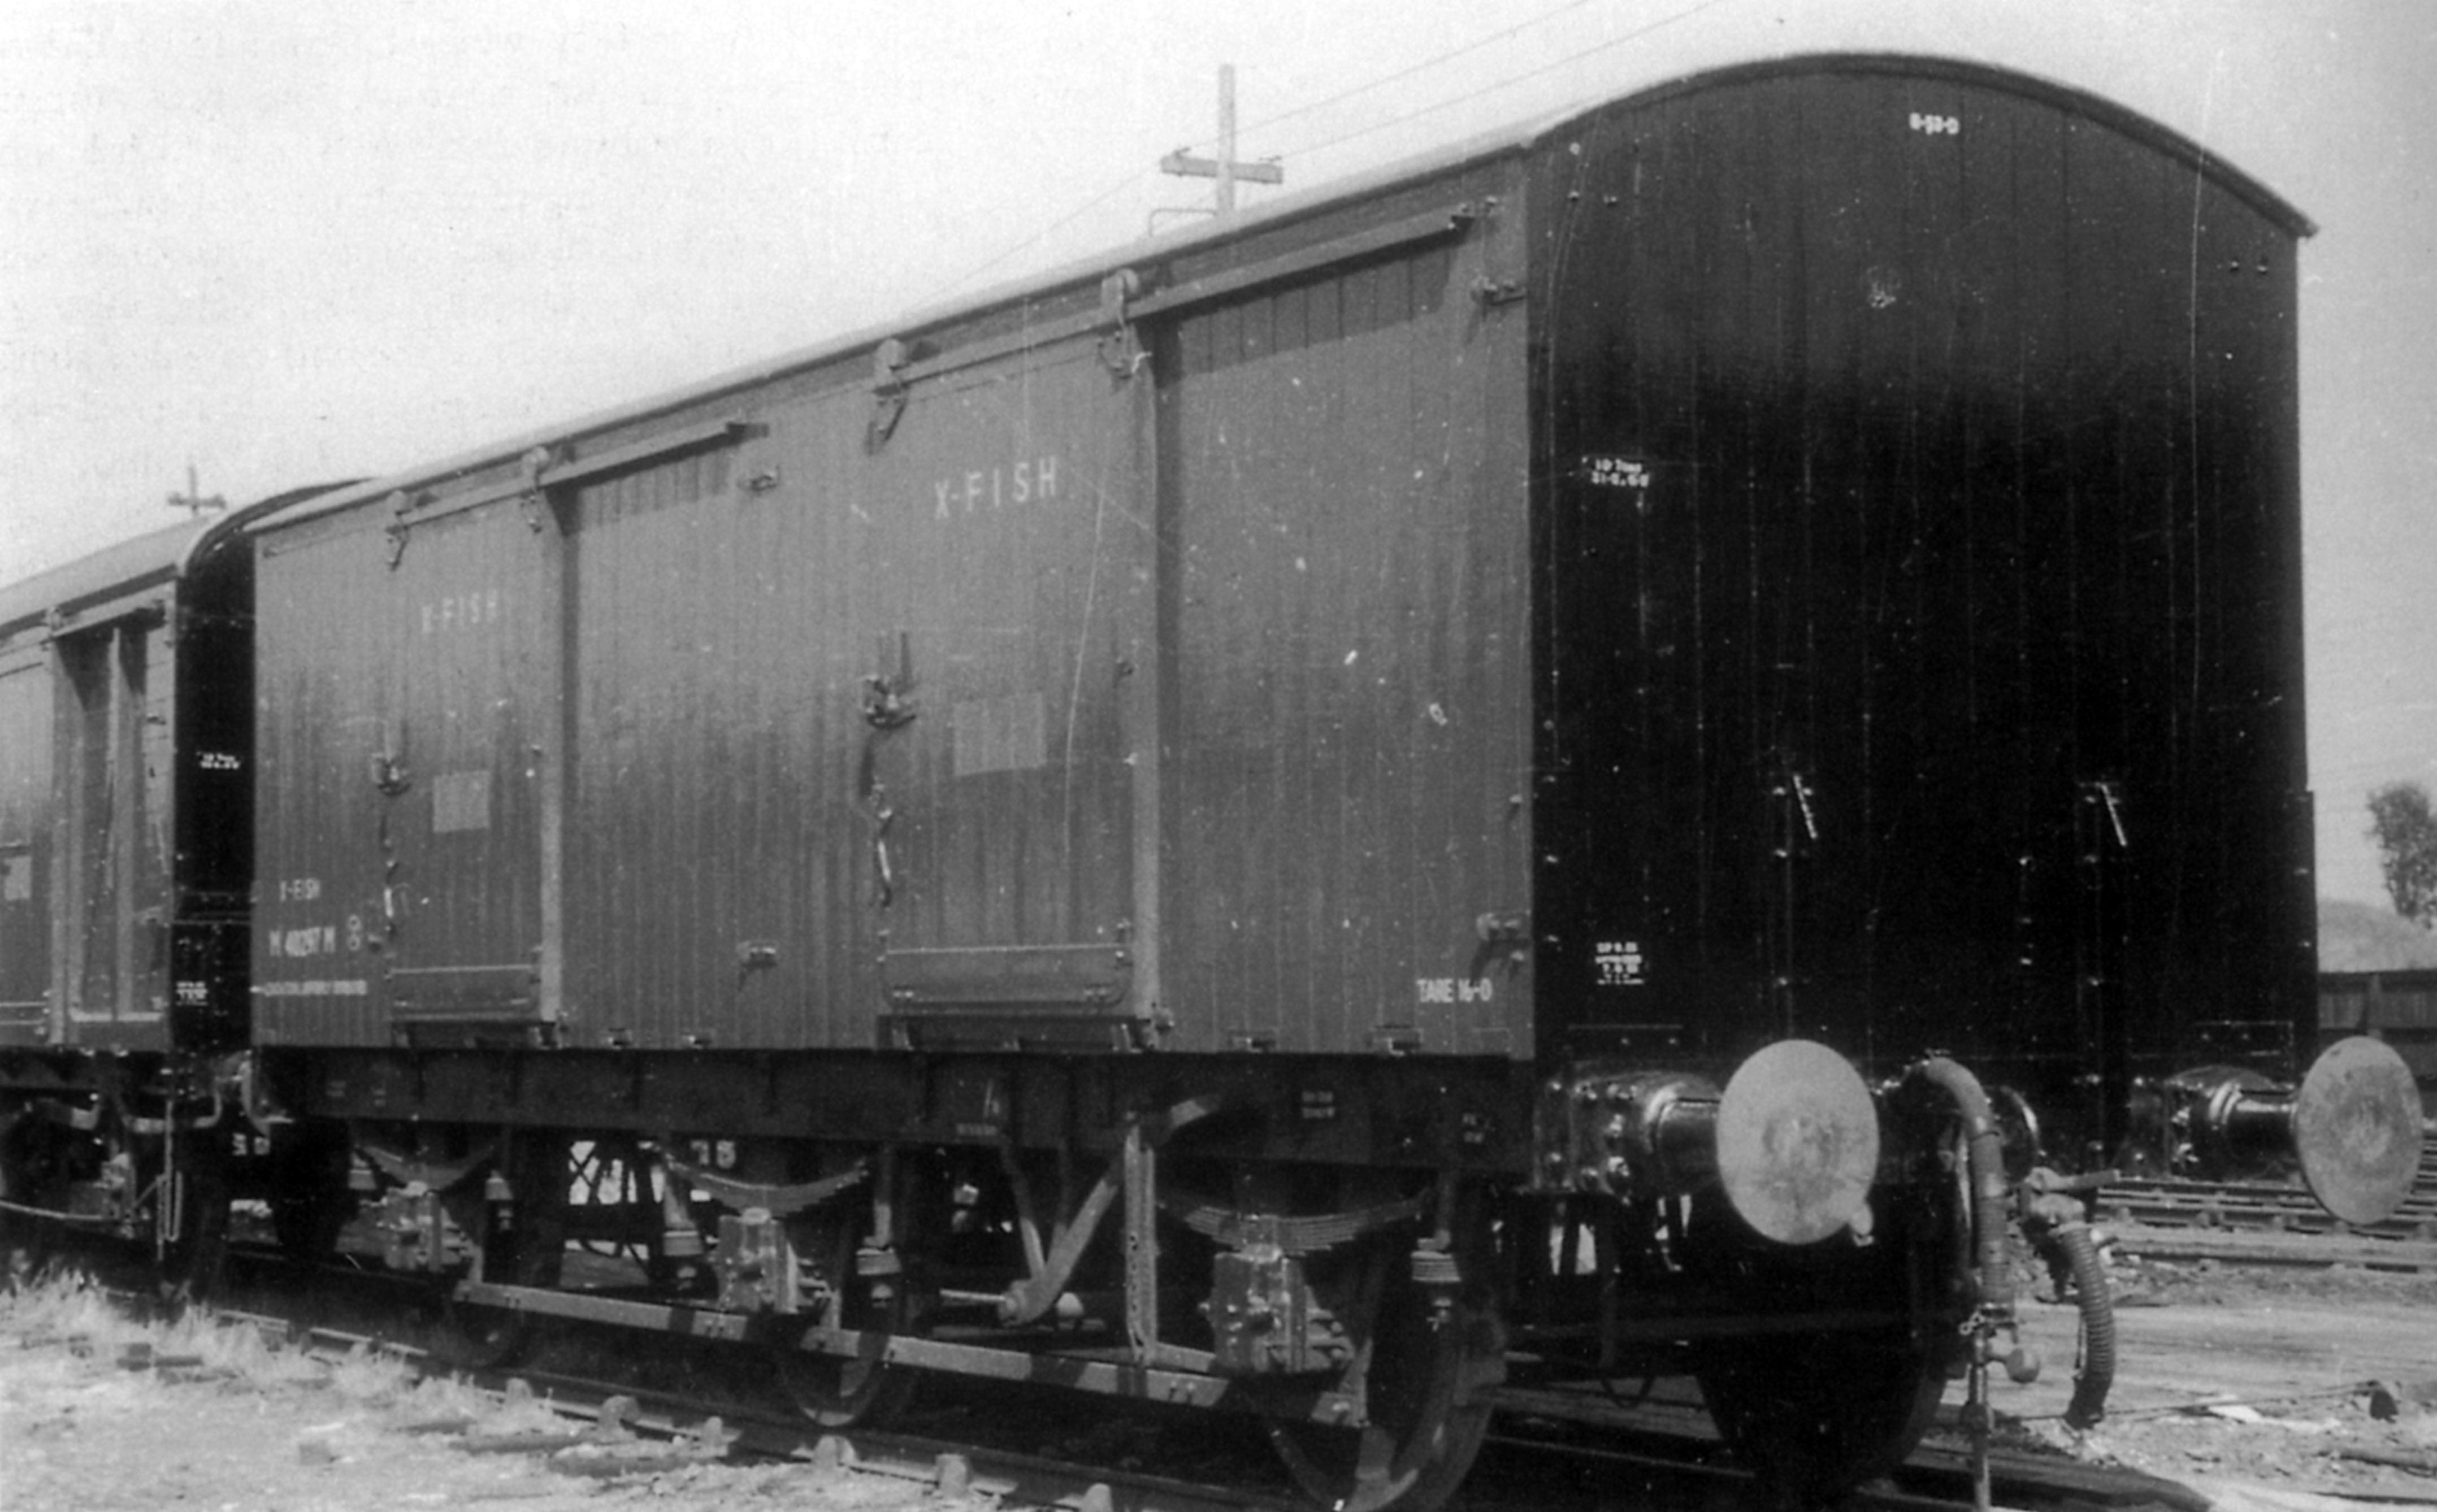 Alextrack: Model Railways: 2mm Finescale: Non Passenger Carrying